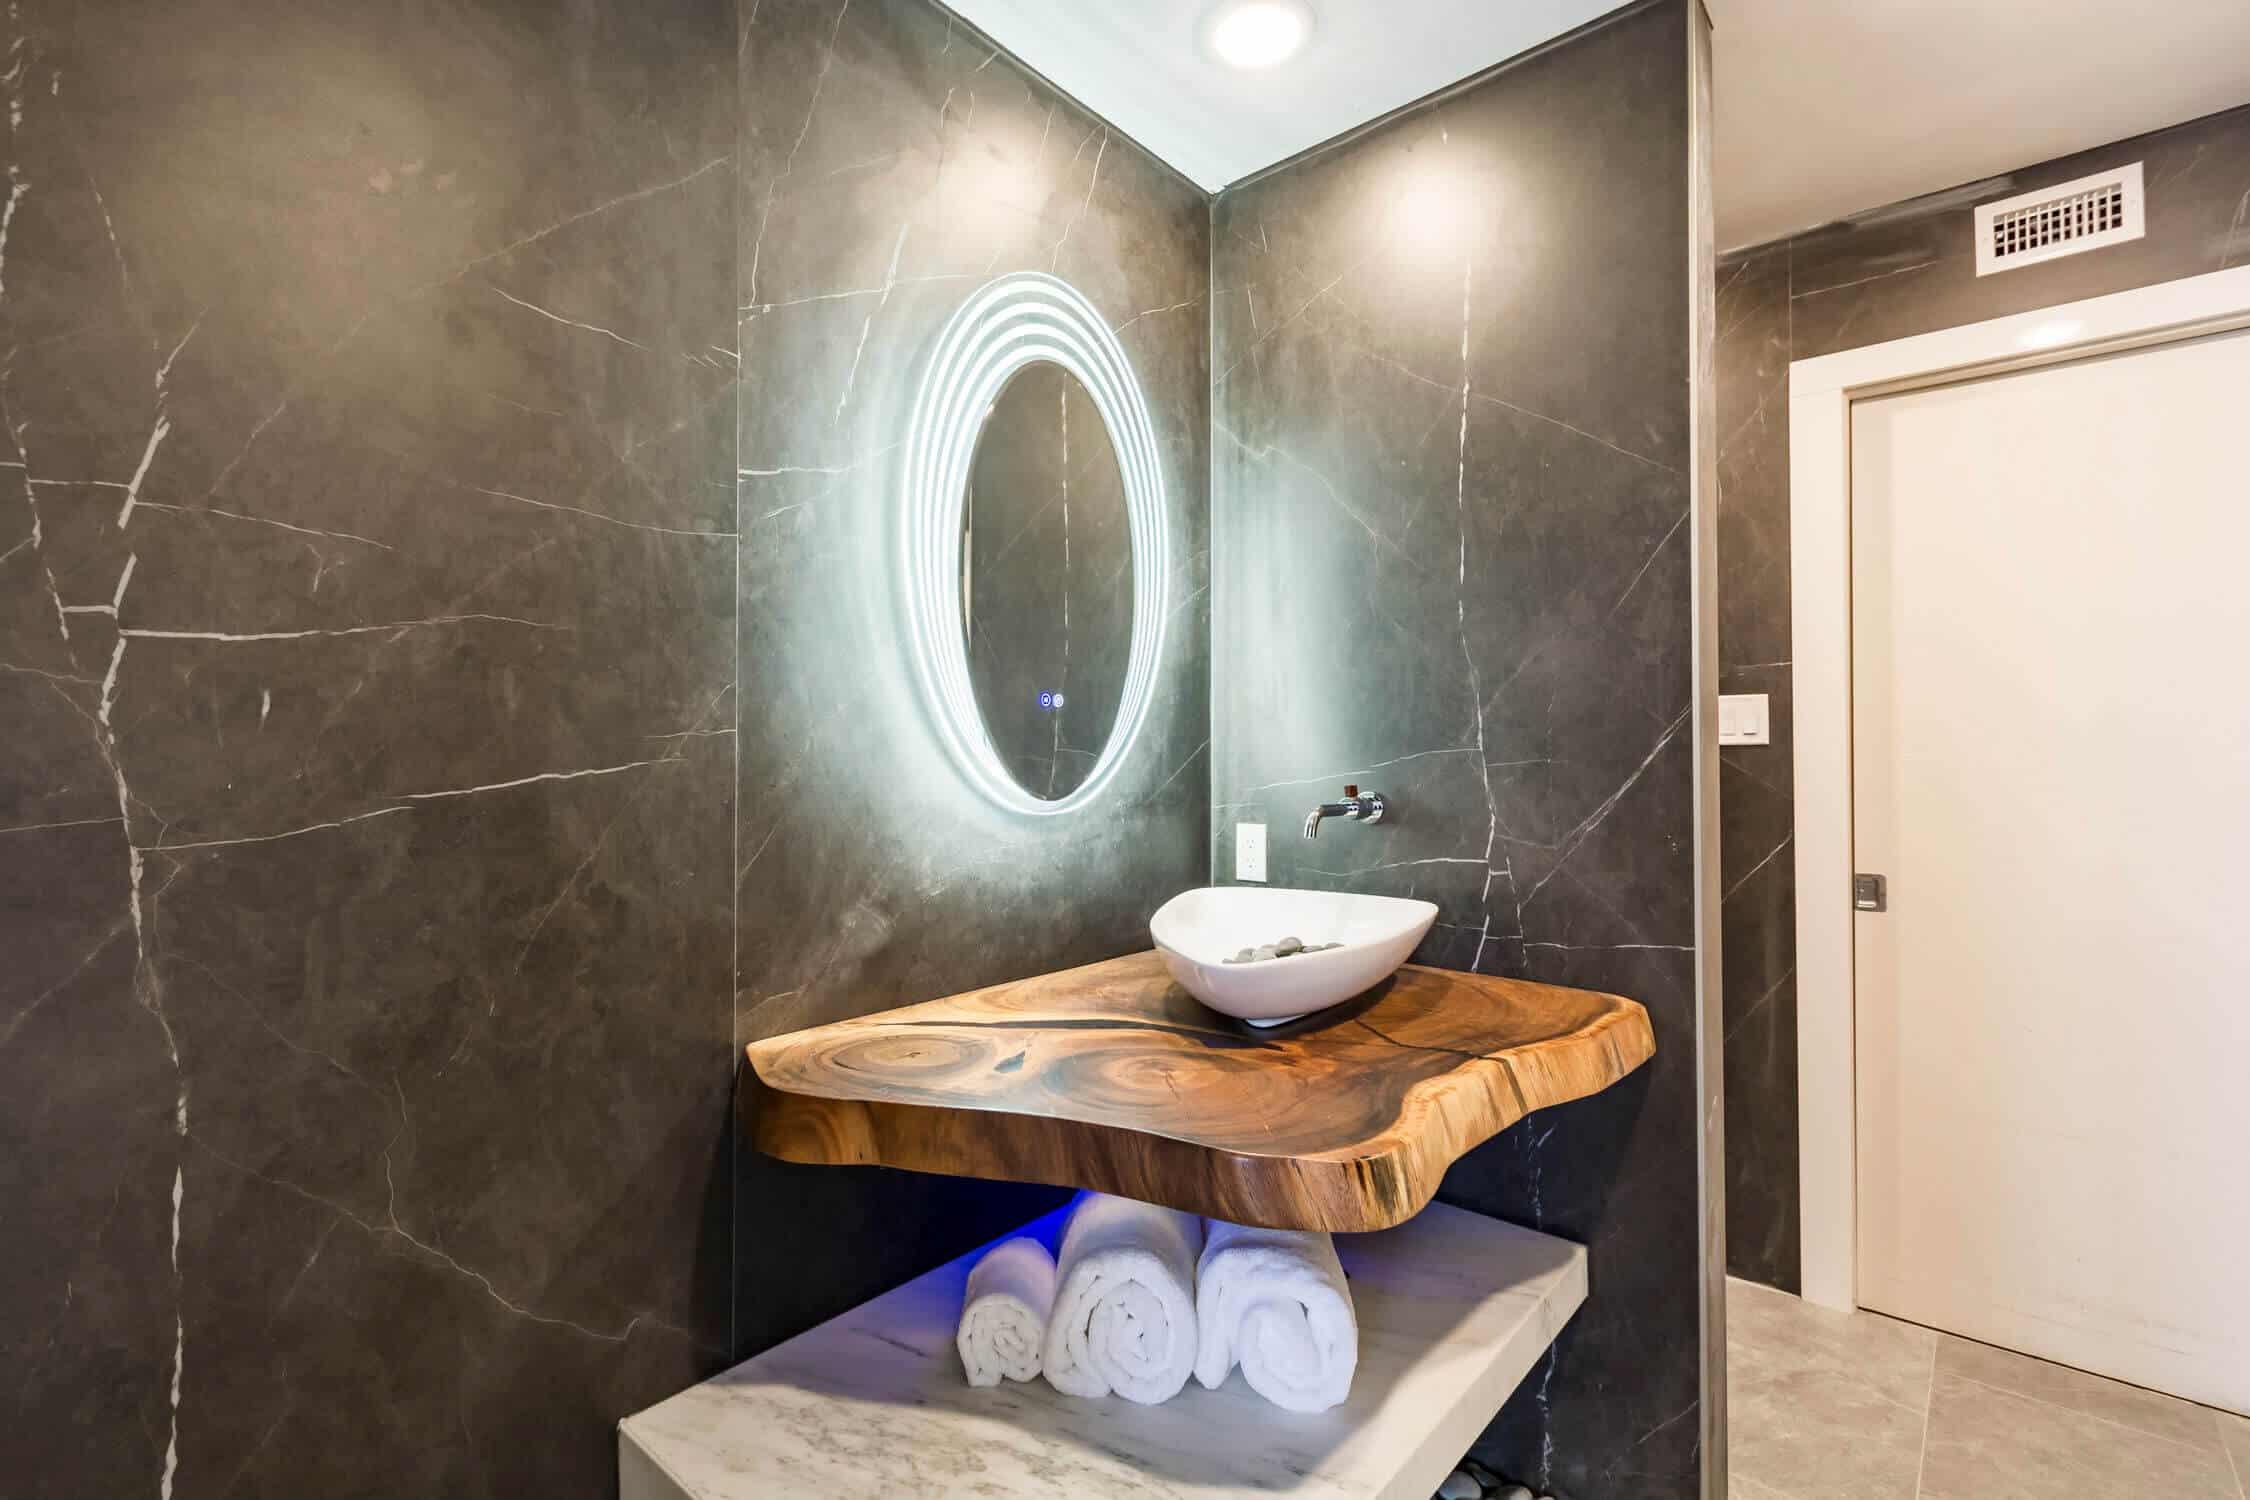 bathroom with lights on mirror